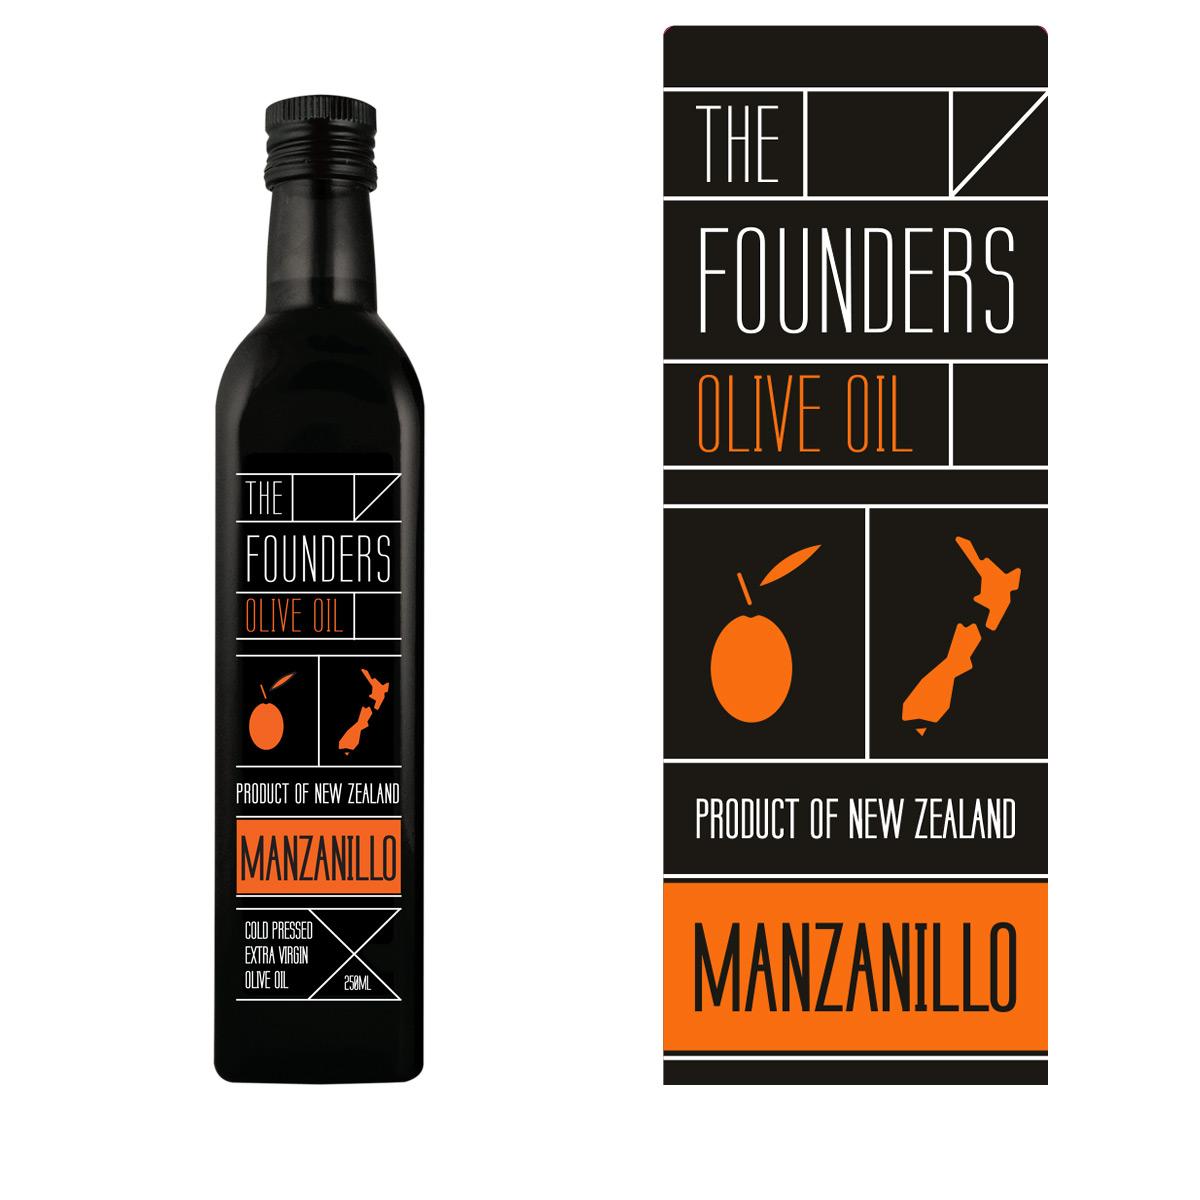 The-Founders-Olive-Oil-Manzanillo-250ml-1200×1200